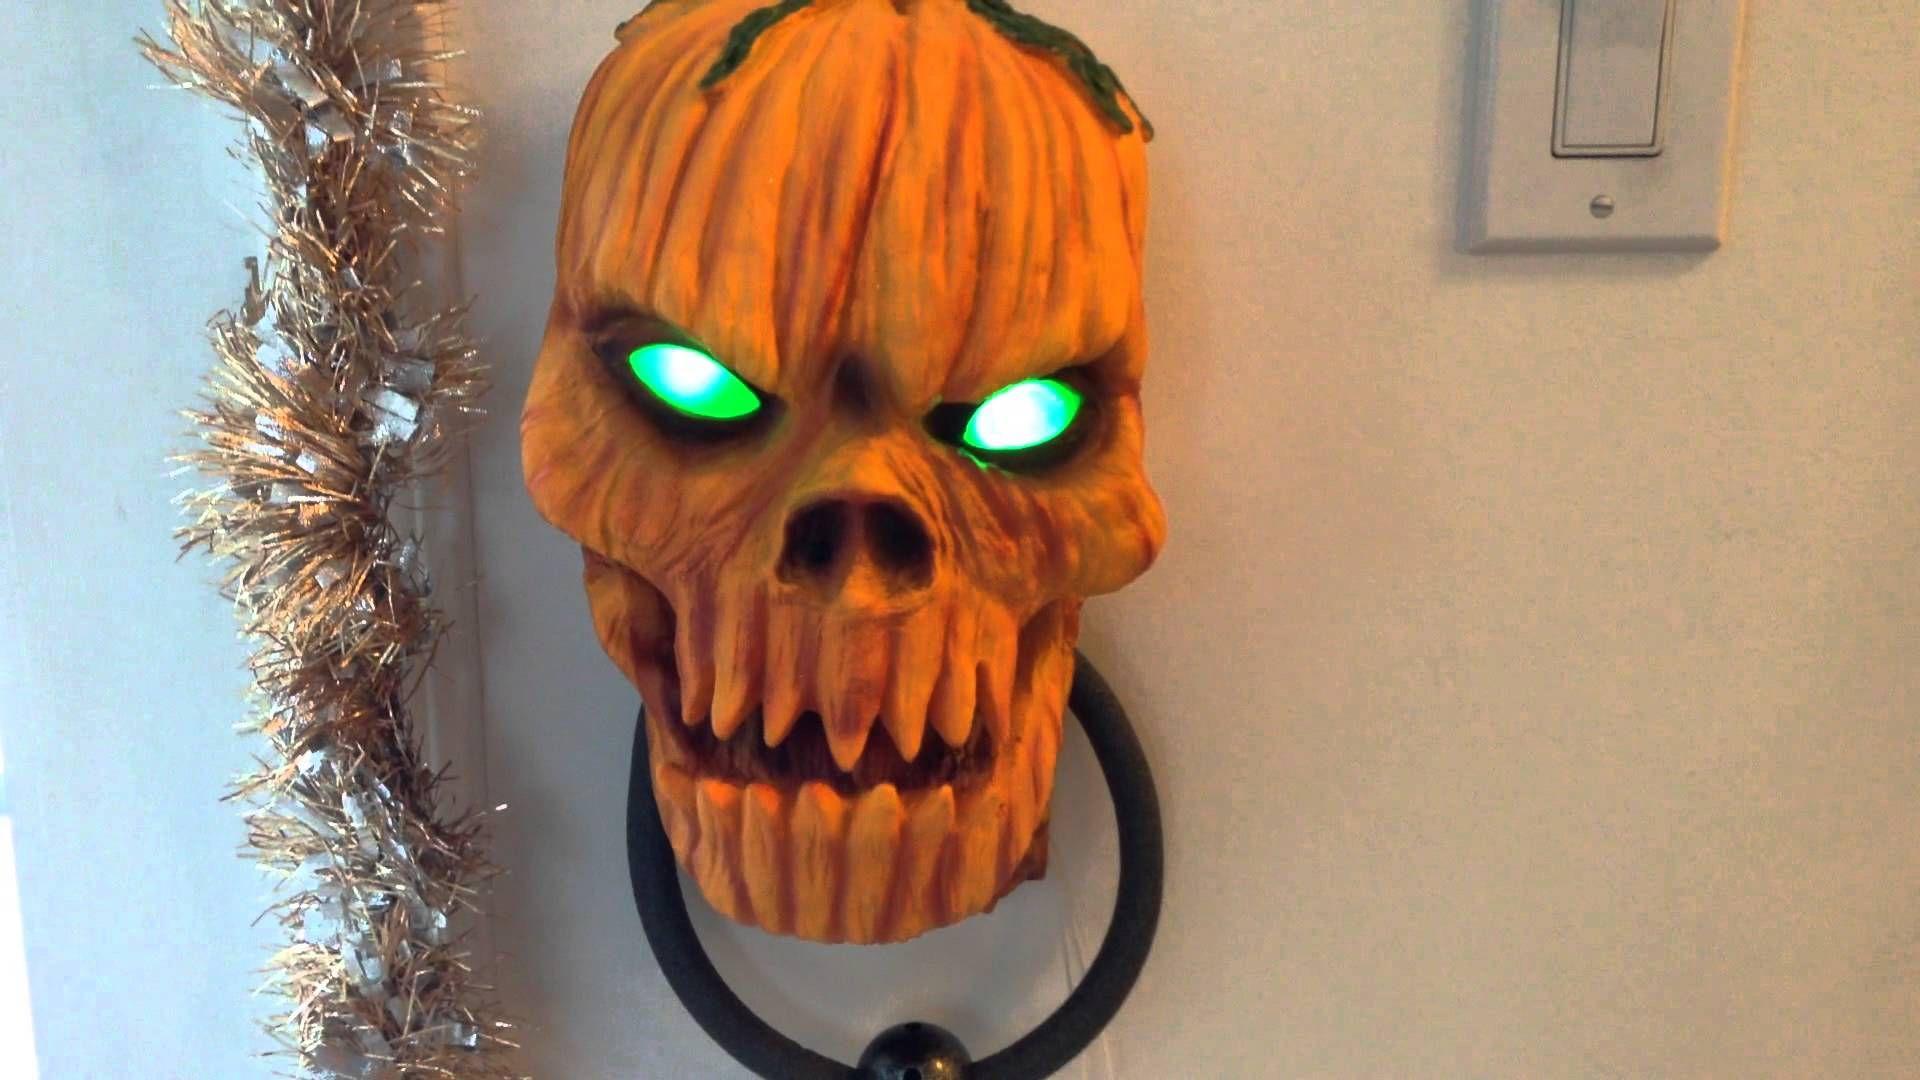 Maxresdefault Jpg  C2 B7 Spirit Halloweenhalloween